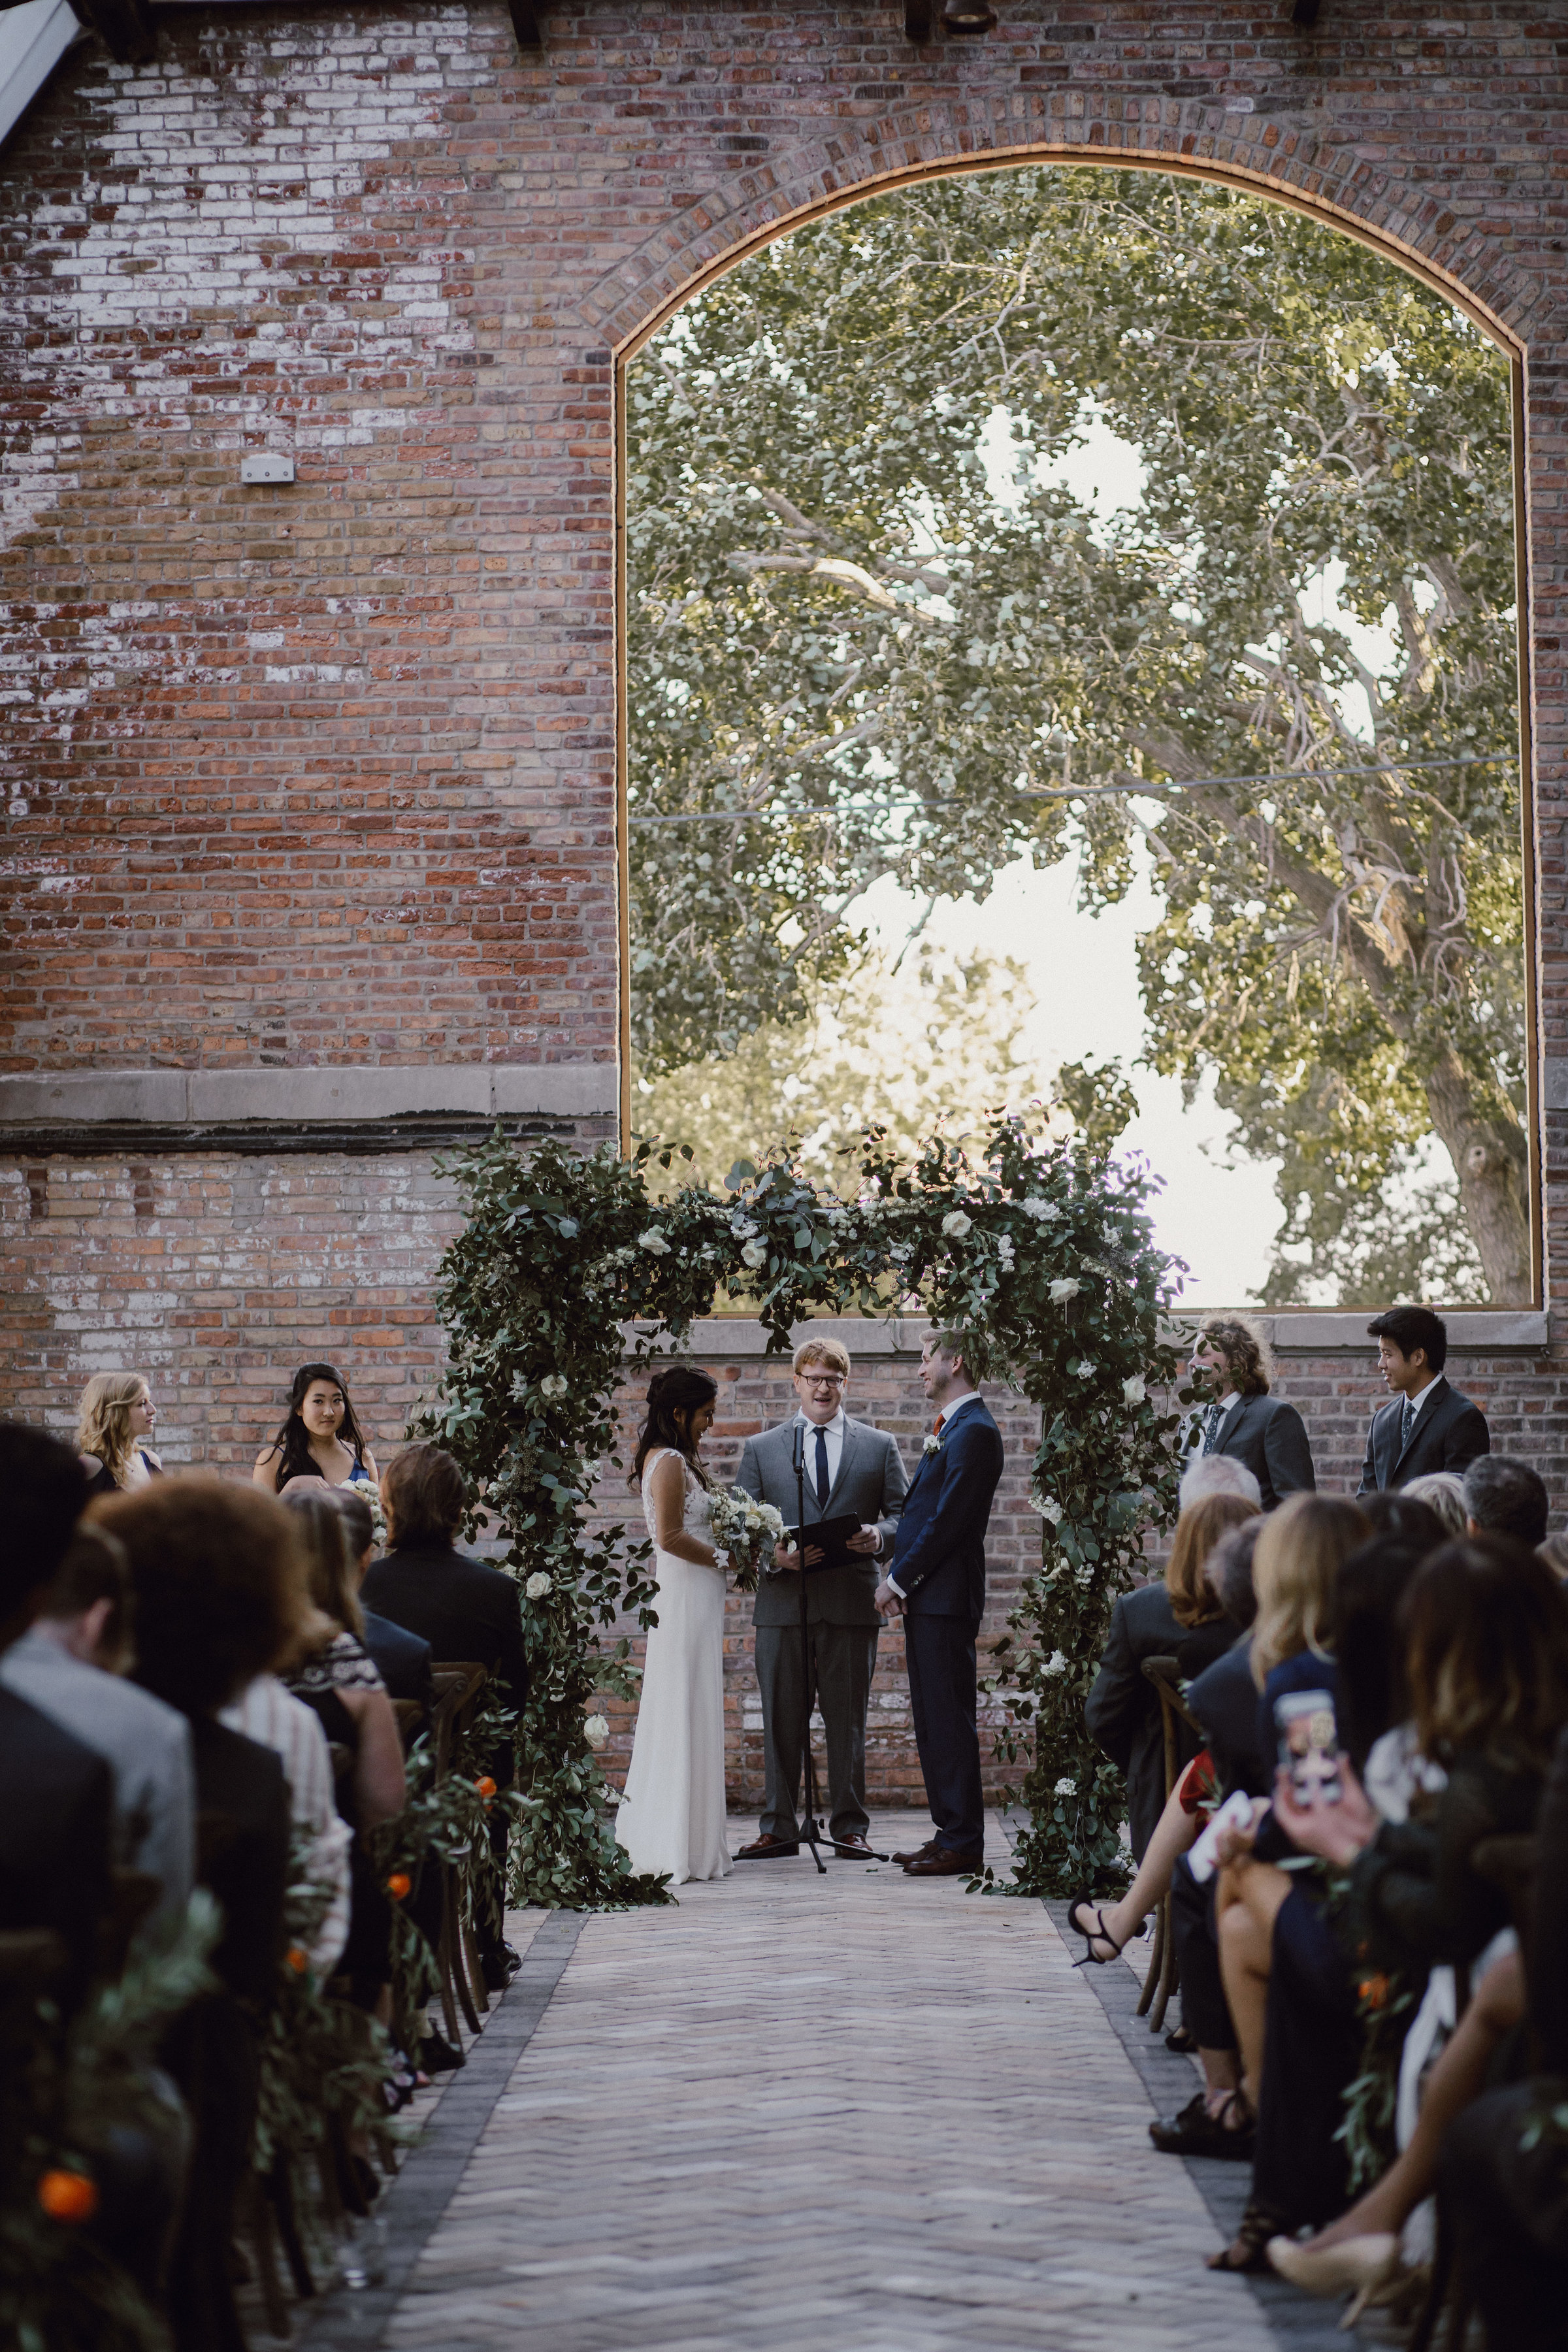 Bridgeport Art Center Wedding Ceremony, Flowers by Fleur Inc, Photo by Megan Saul Photography